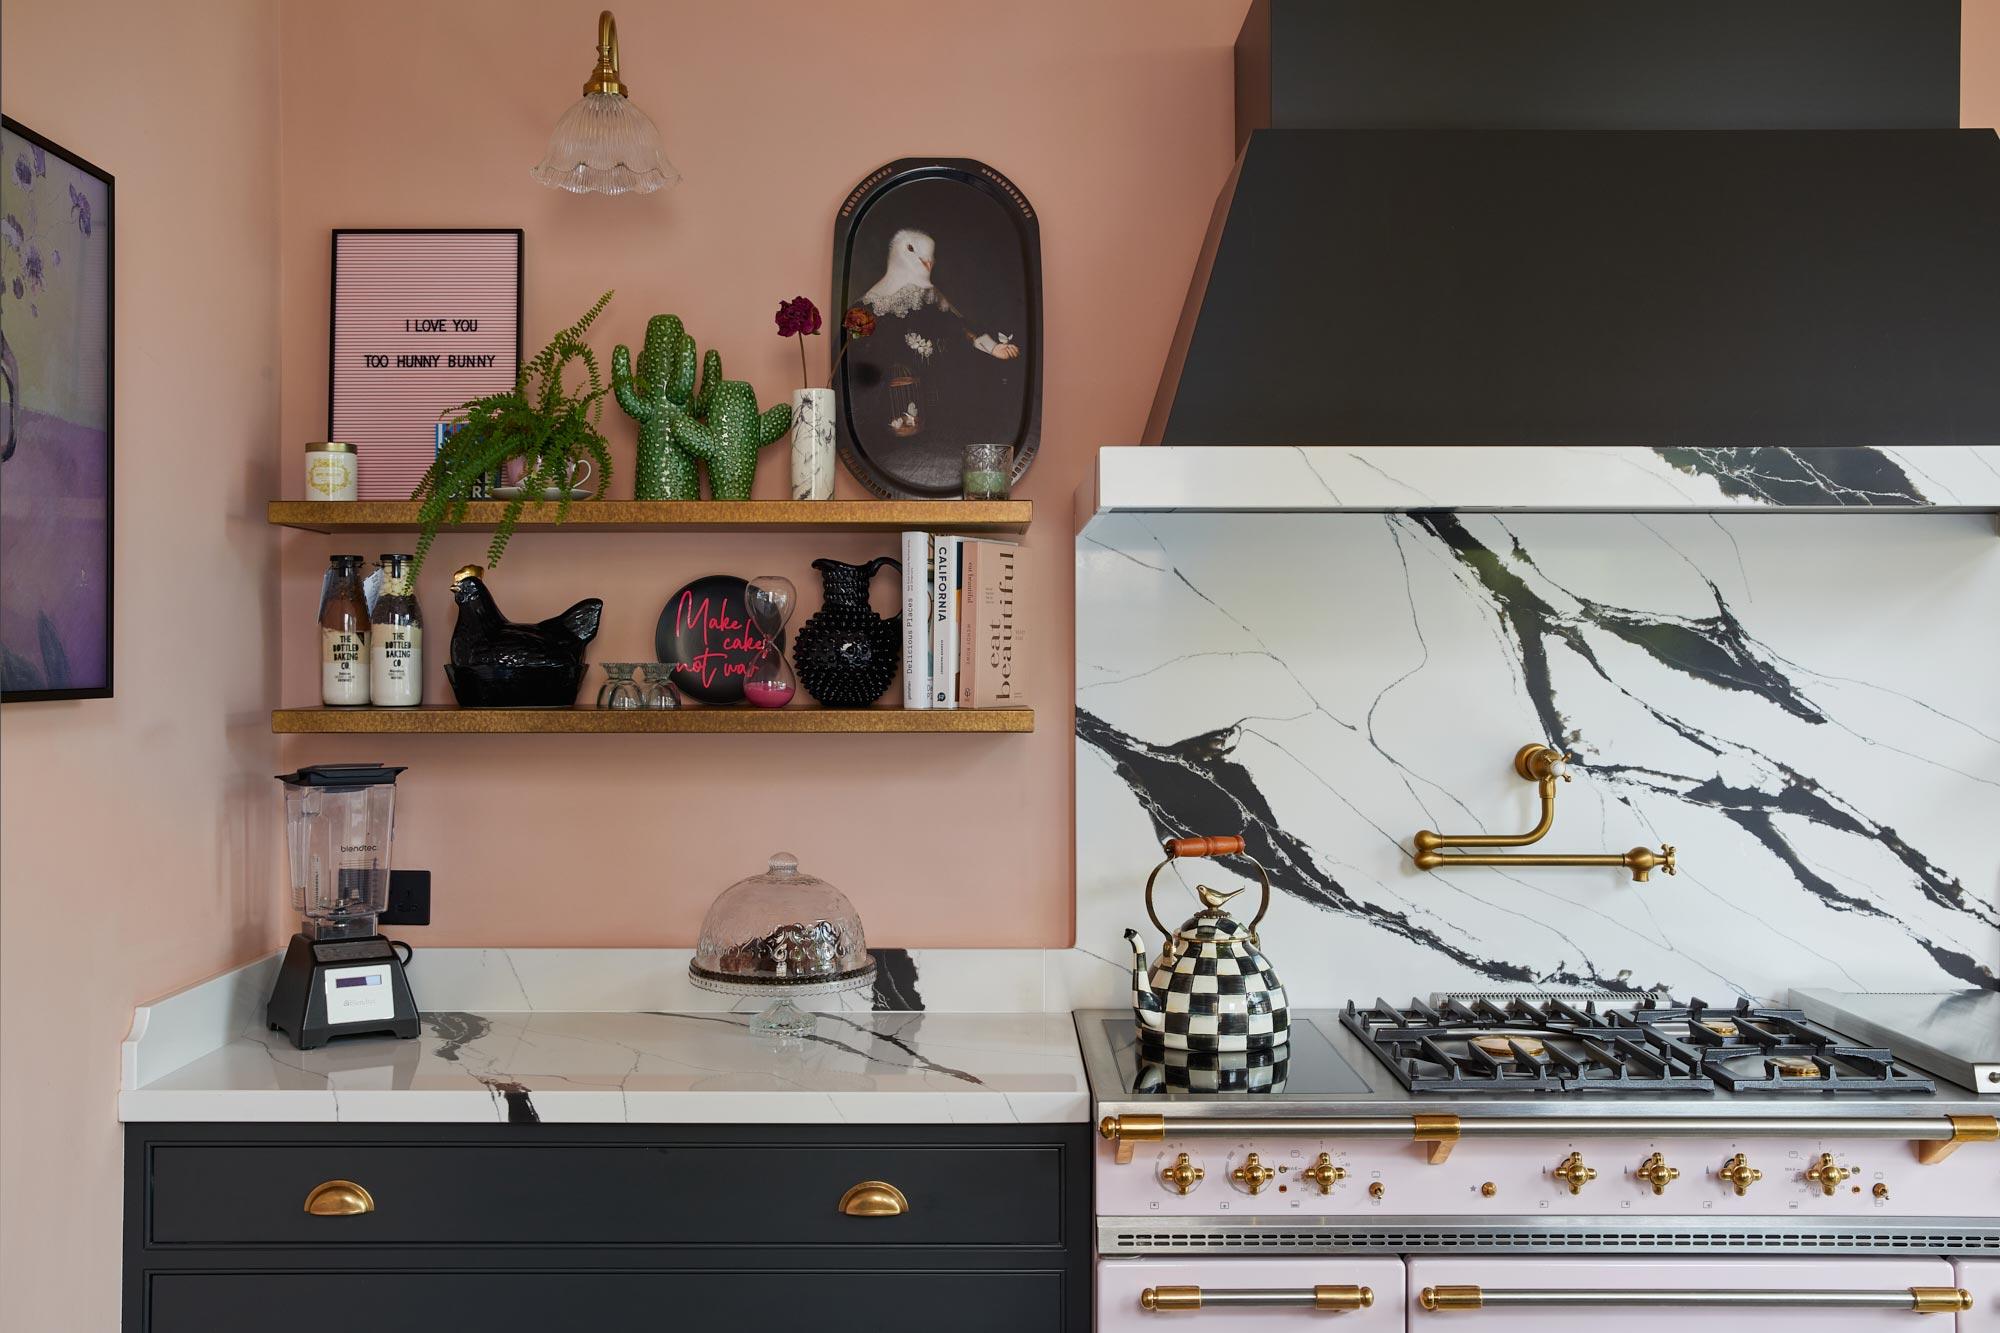 Pink Lacanche range cooker